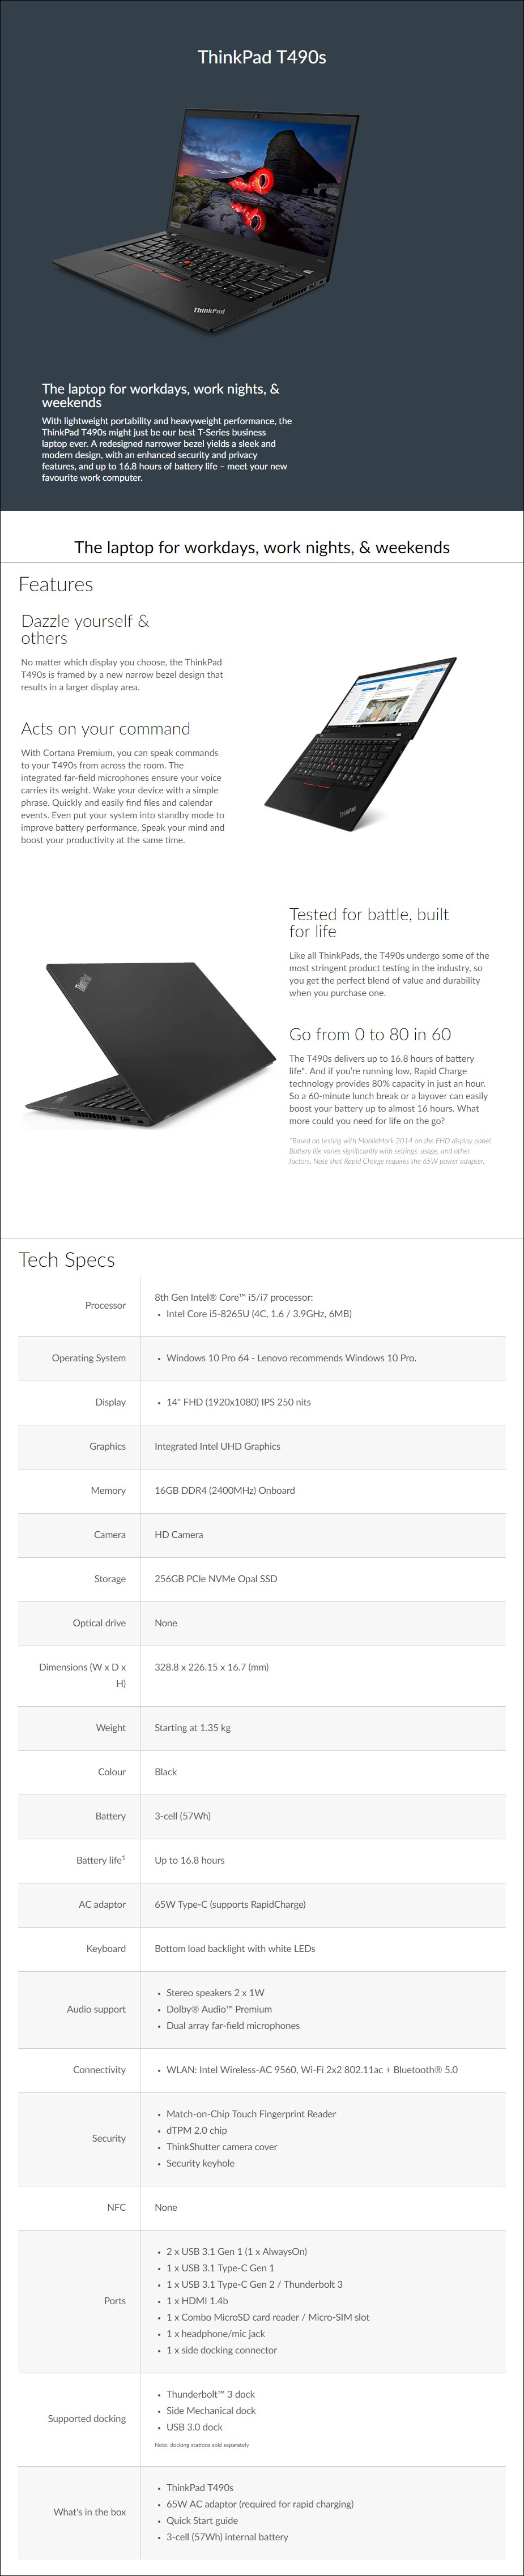 "Lenovo ThinkPad T490s 14"" Laptop i5-8265U 16GB 256GB SSD W10P - Overview 1"